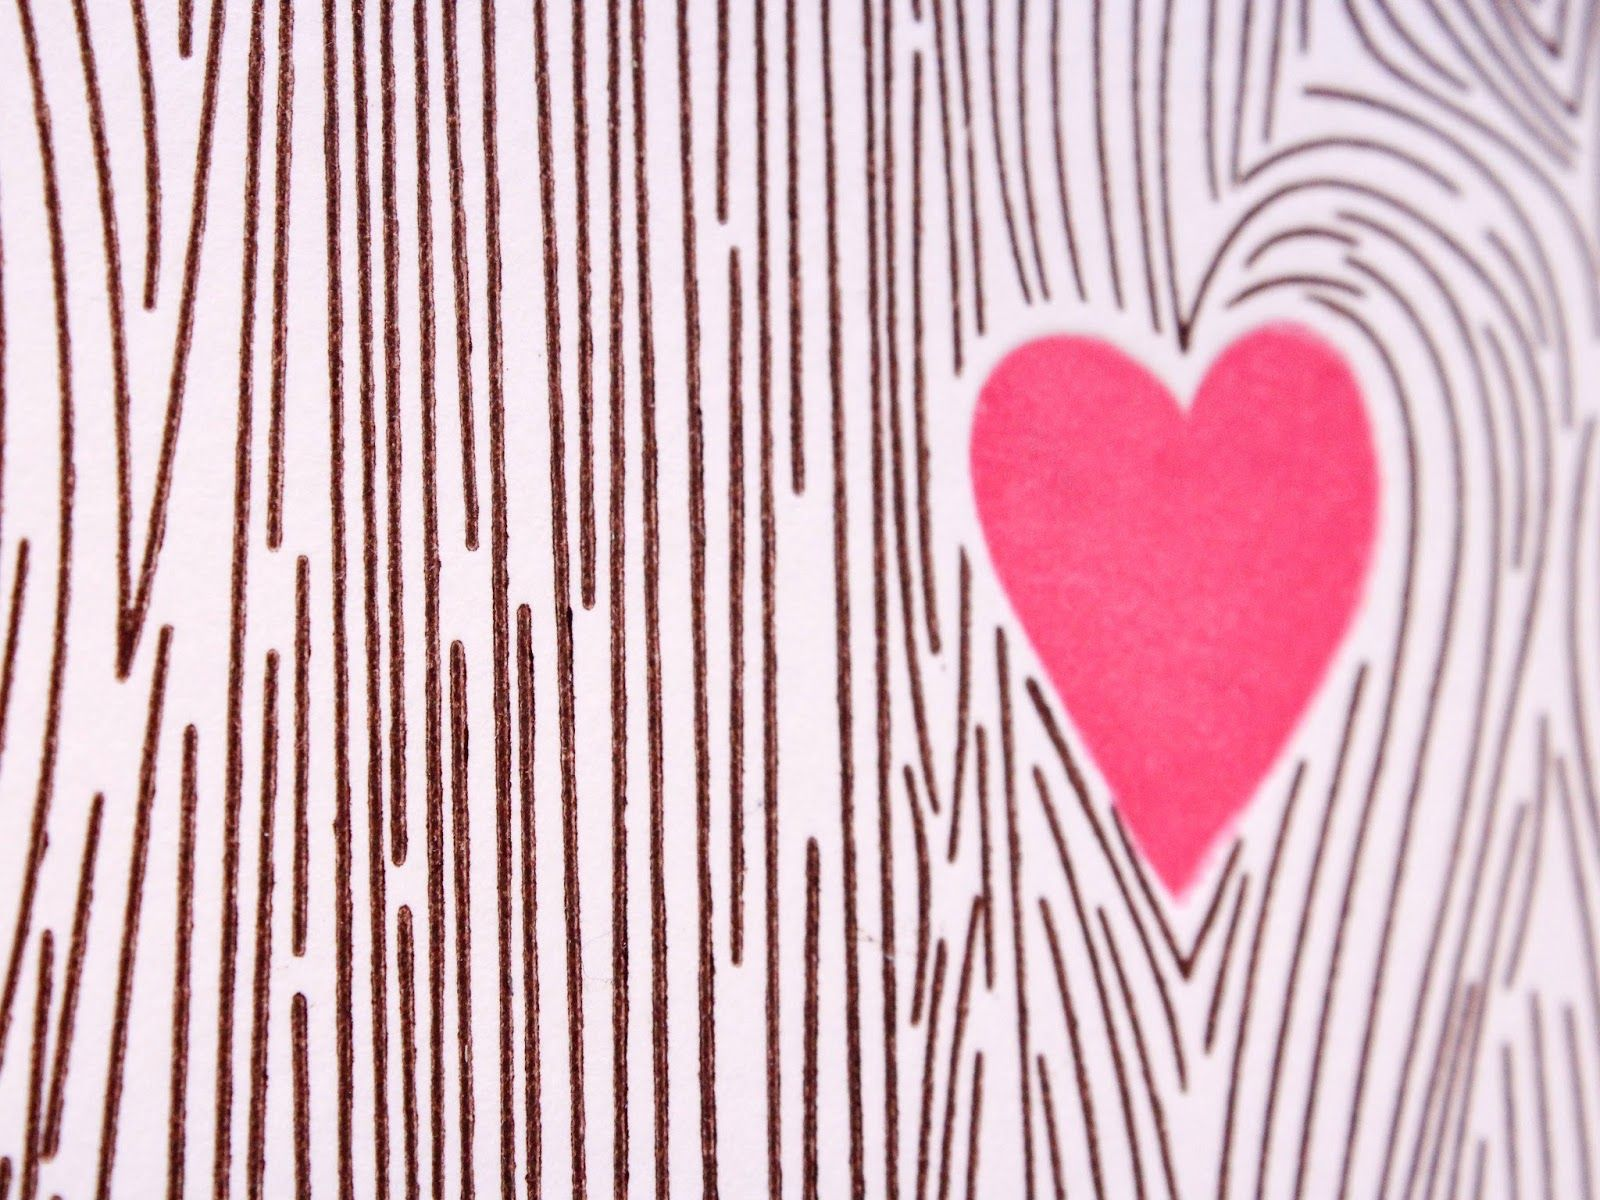 Sprinkled With Glitter: Woodgrain Background Valentines